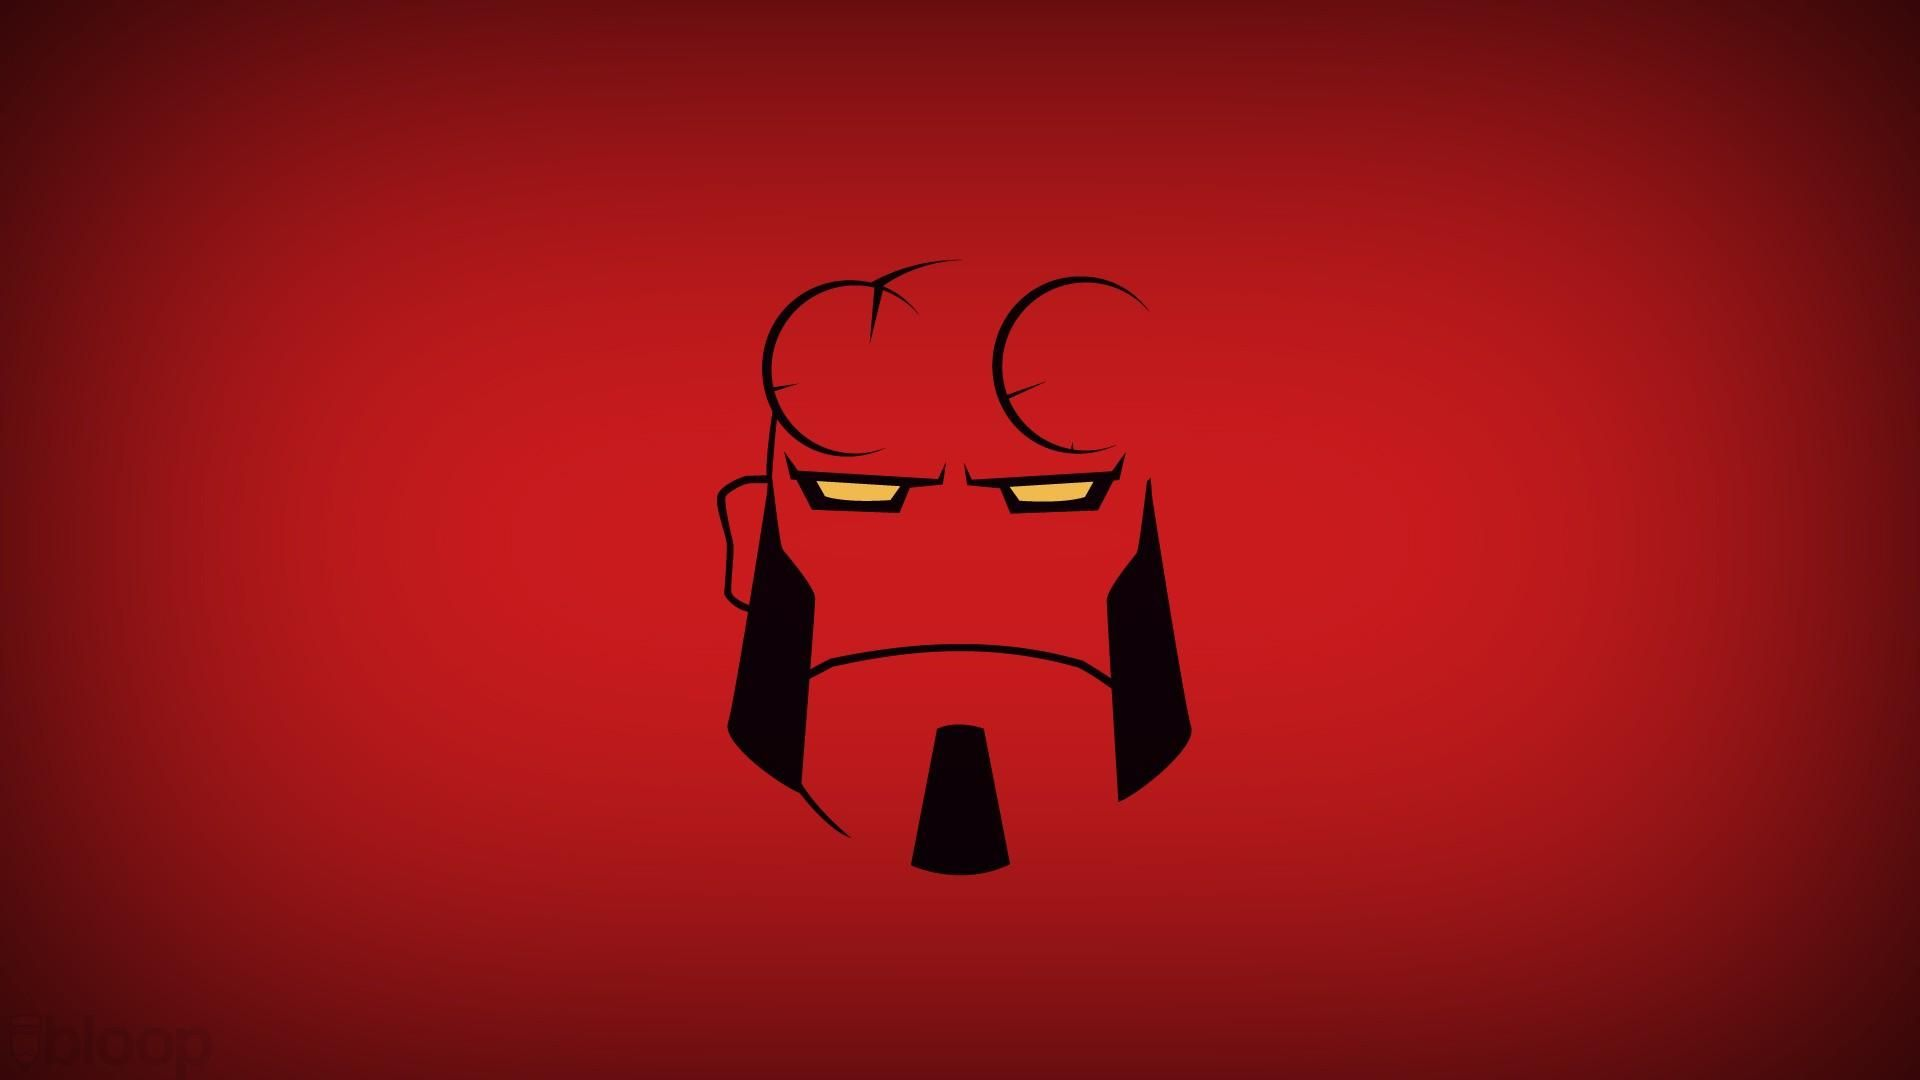 Iphone Wallpaper Hellboy Hellboy Hd Wallpaper Get It Now